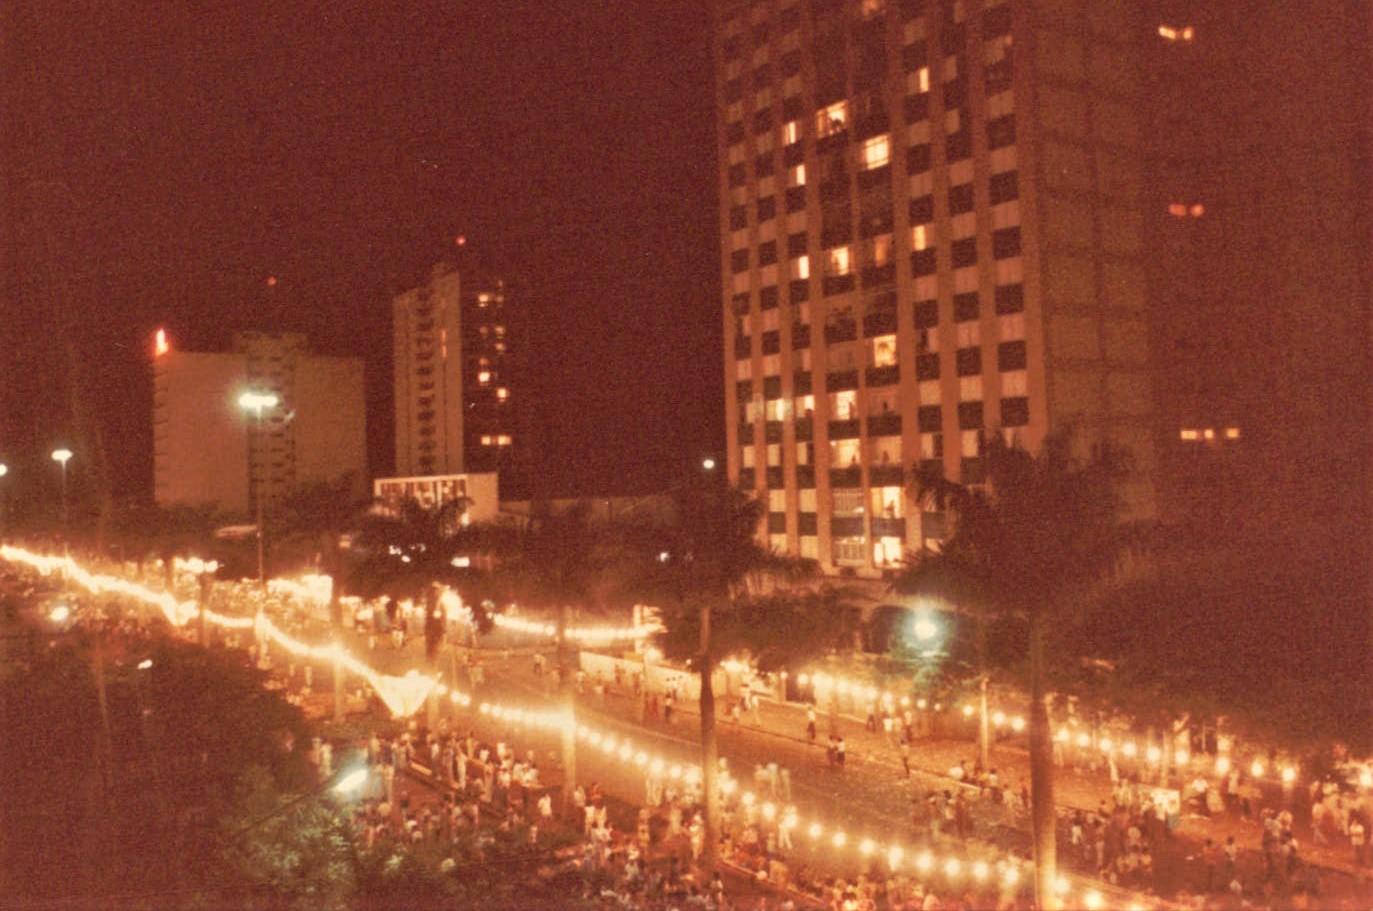 Avenida Getúlio Vargas - 1977